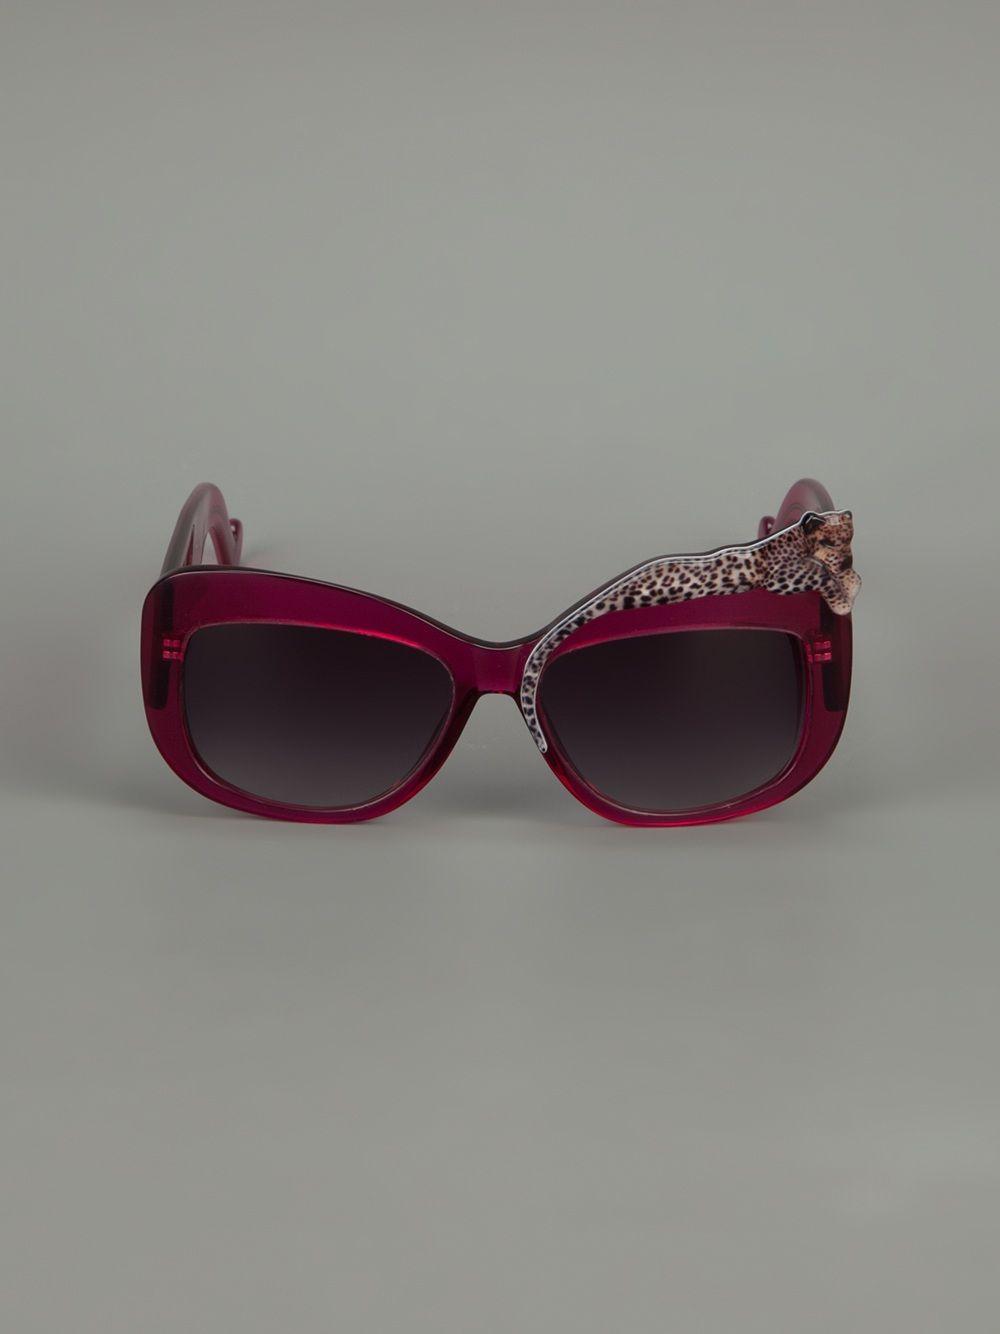 Anna Karin Karlsson- 'Rose Et La Mer' Sunglasses